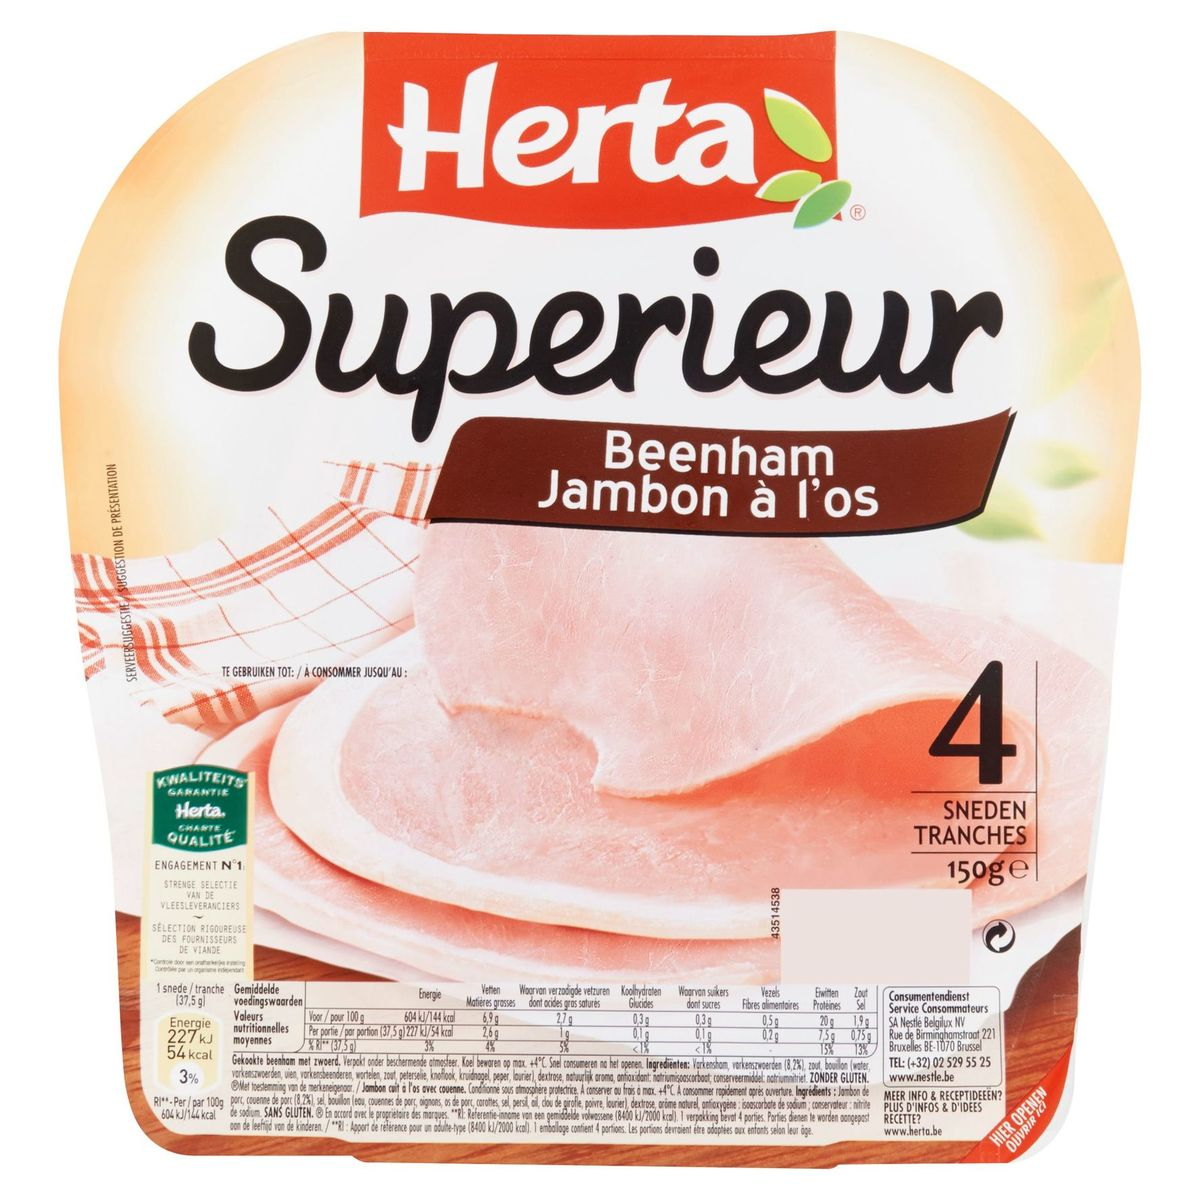 Herta Superieur Jambon à l'Os 4 Tranches 150 g